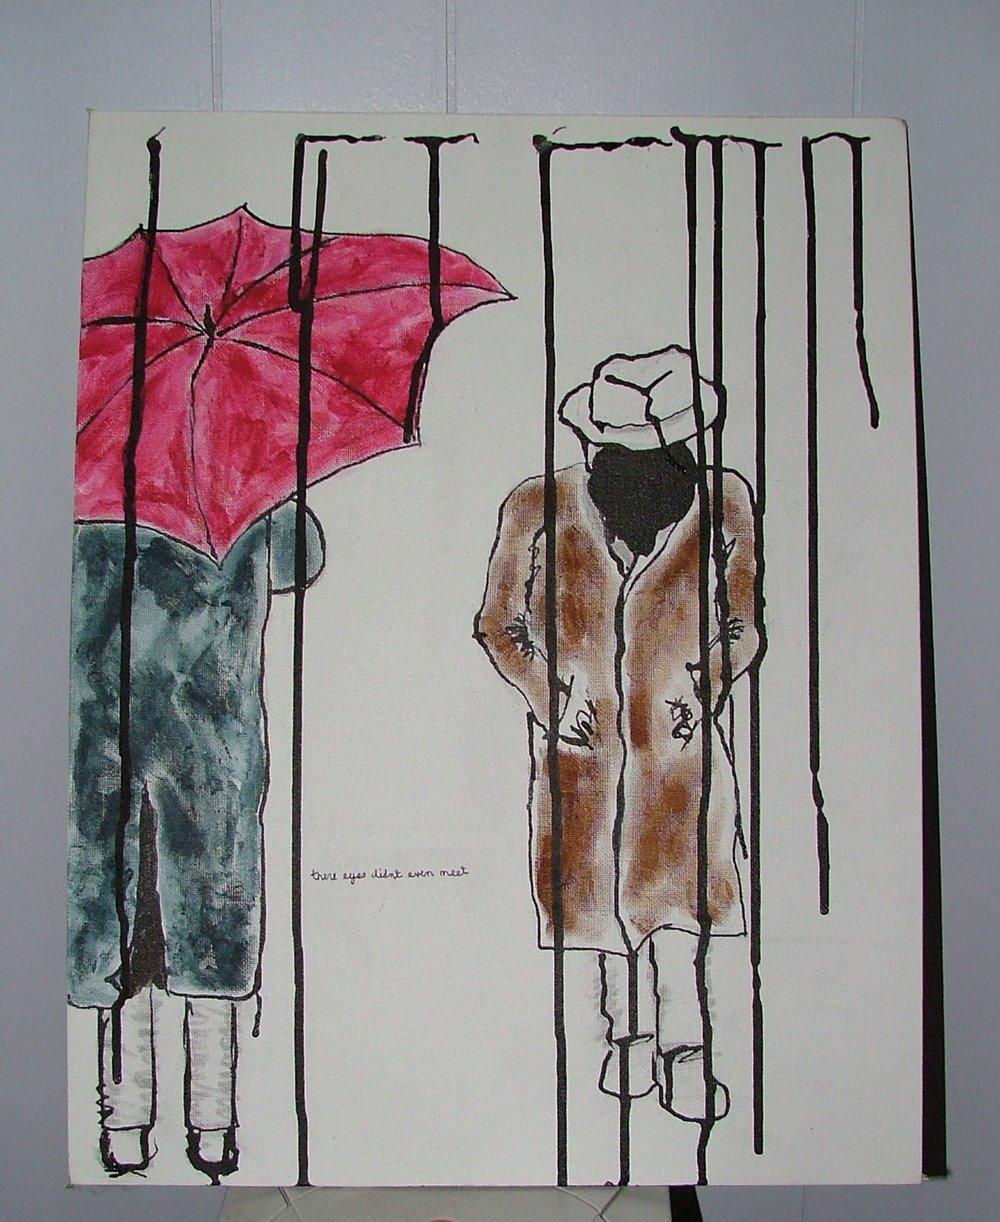 [rain+painting.php]